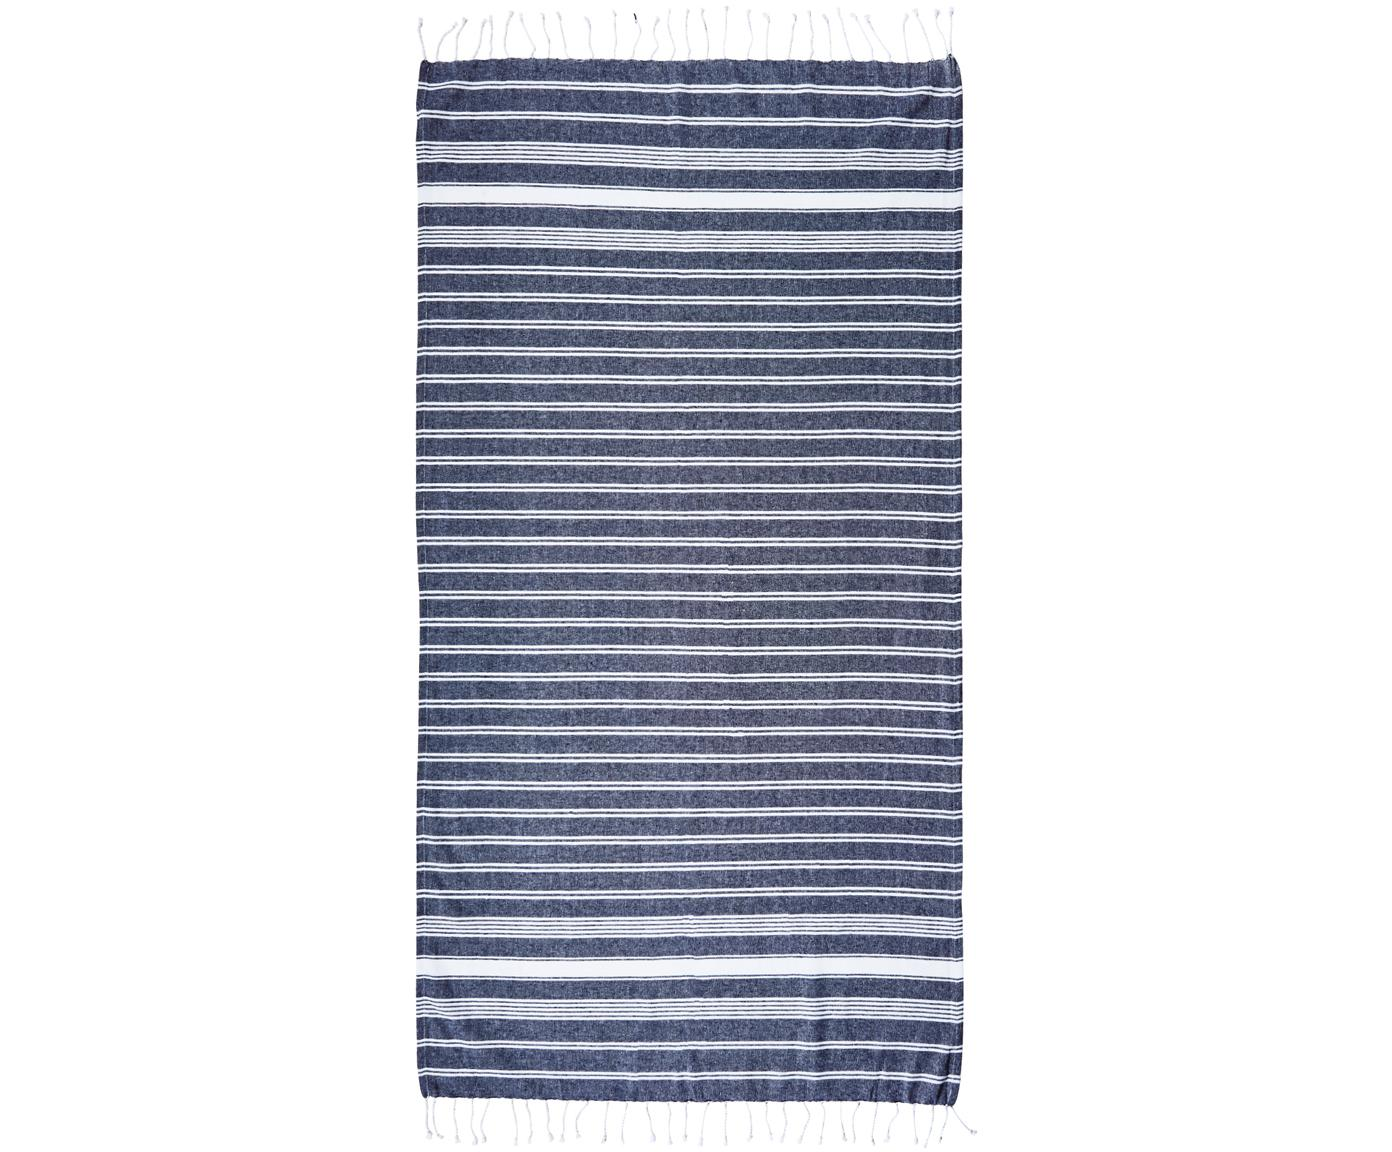 Telo mare Surfside, 100% cotone, Blu scuro, Larg. 90 x Lung. 170 cm